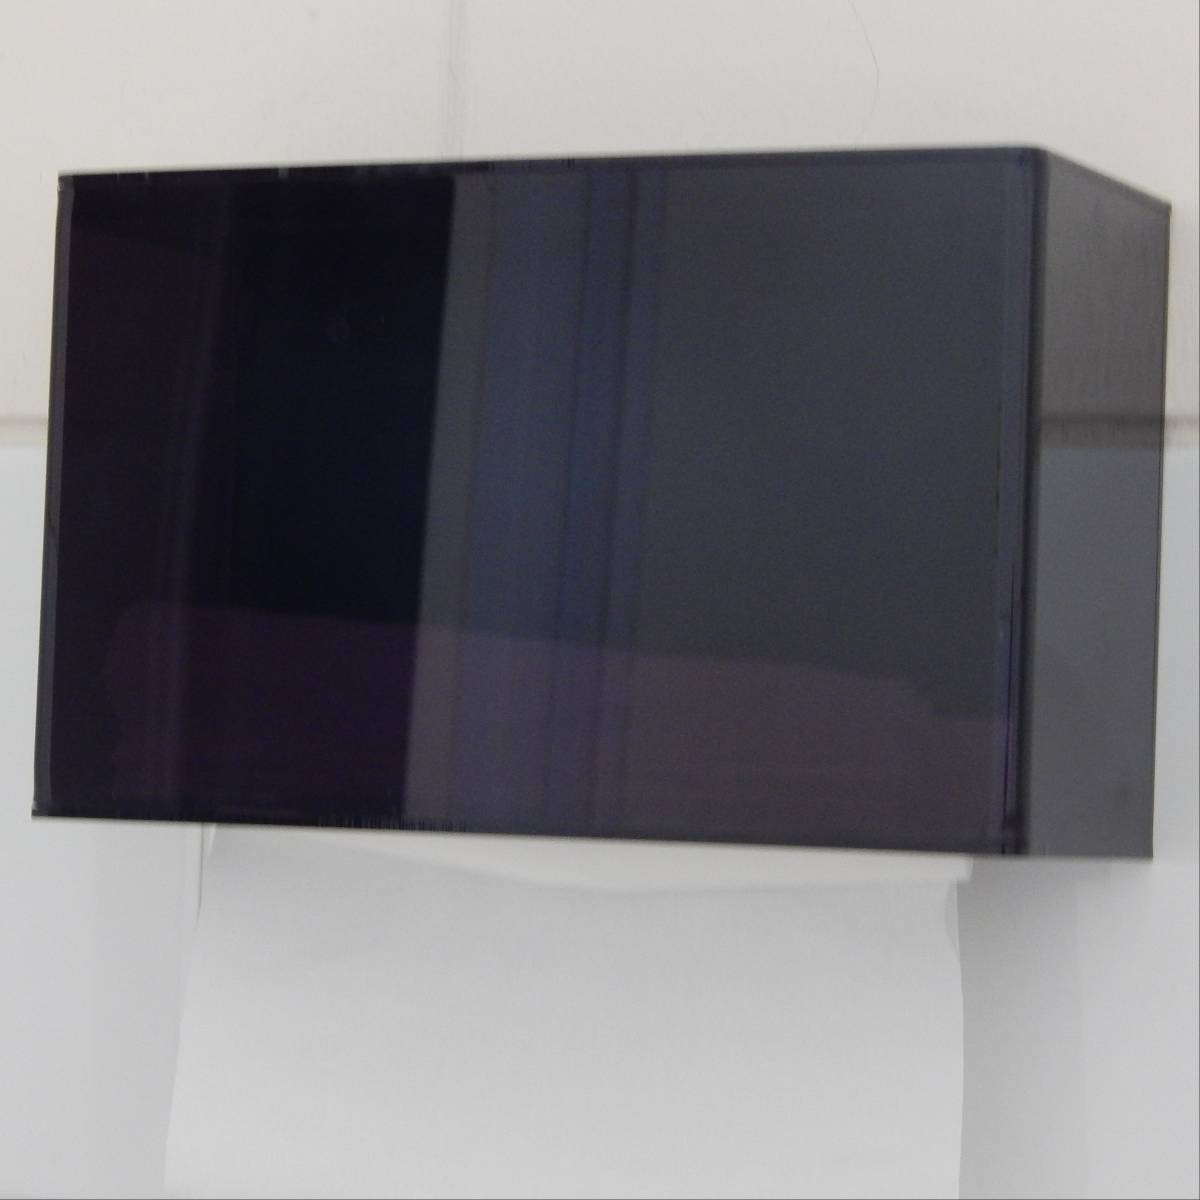 Kotak Tisu Toilet Acrylic Rayben/hand Towel Dispenser